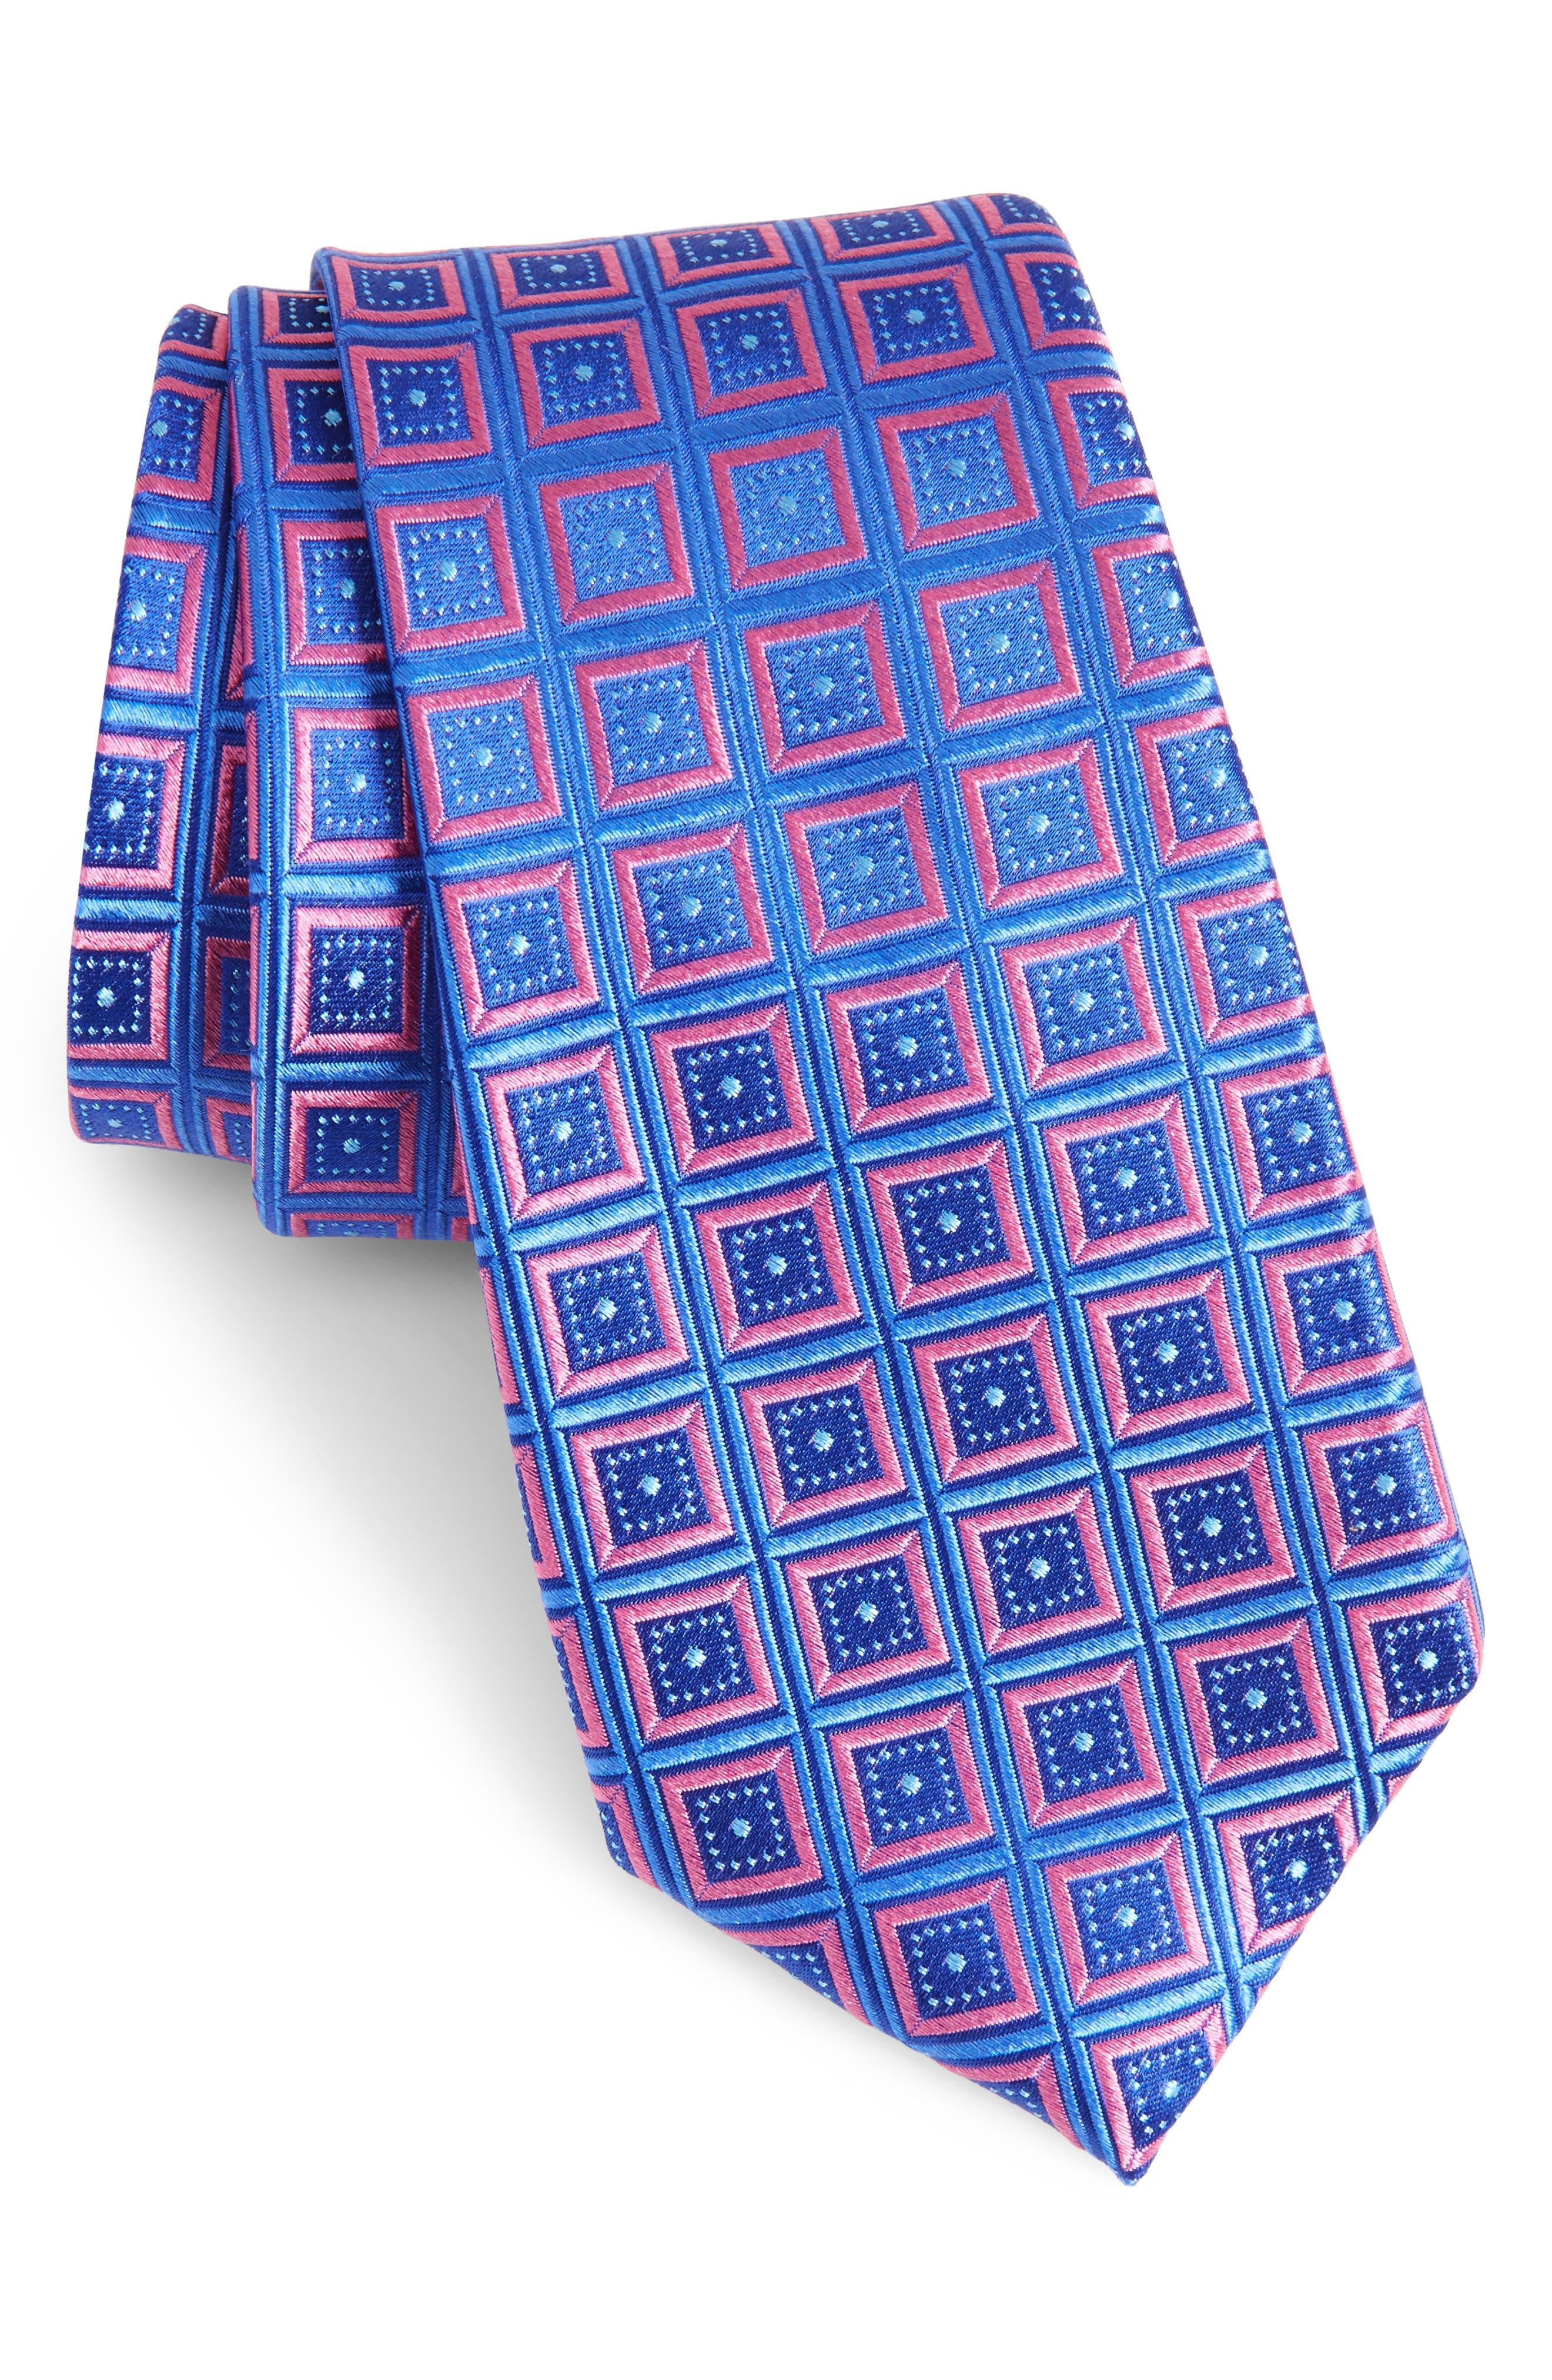 Alternate Image 1 Selected - Nordstrom Men's Shop Sublime Squares Geometric Silk Tie